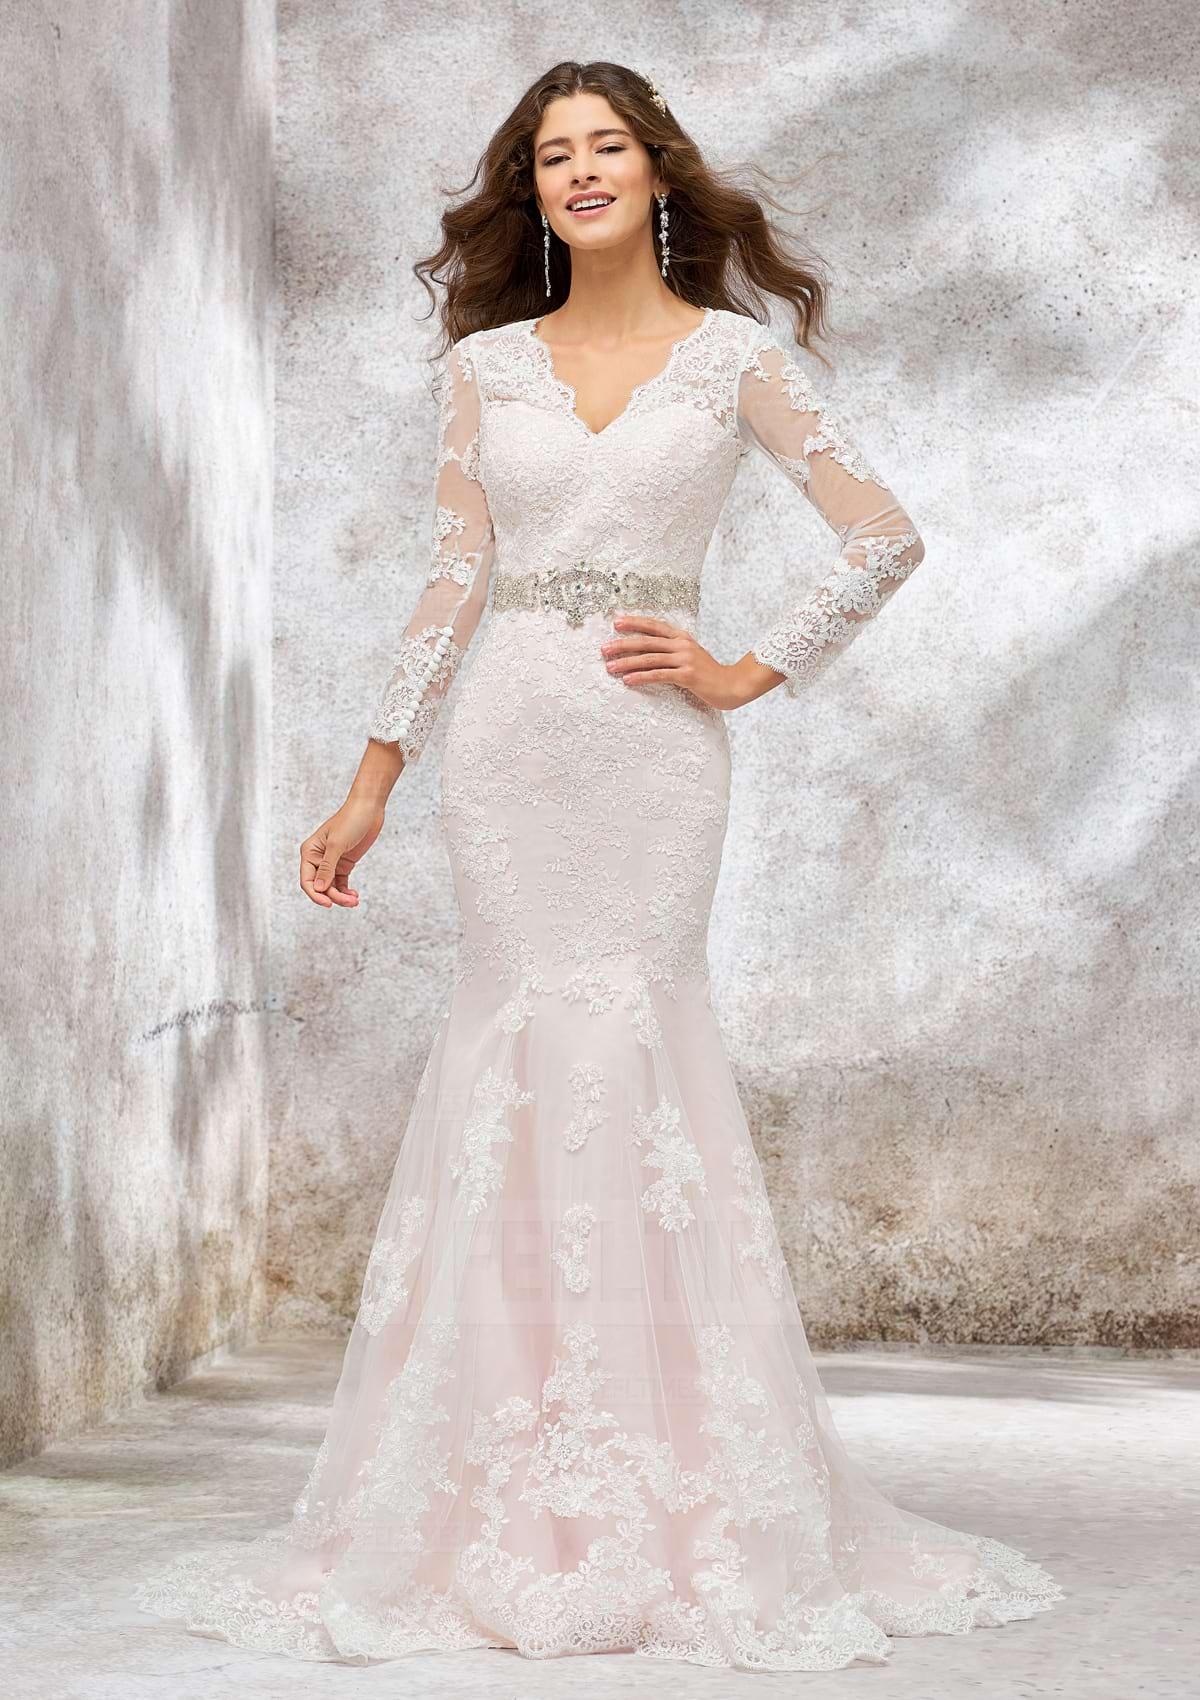 Trumpet/Mermaid Full/Long Sleeve Court Train Lace/Satin Wedding Dress With Beading